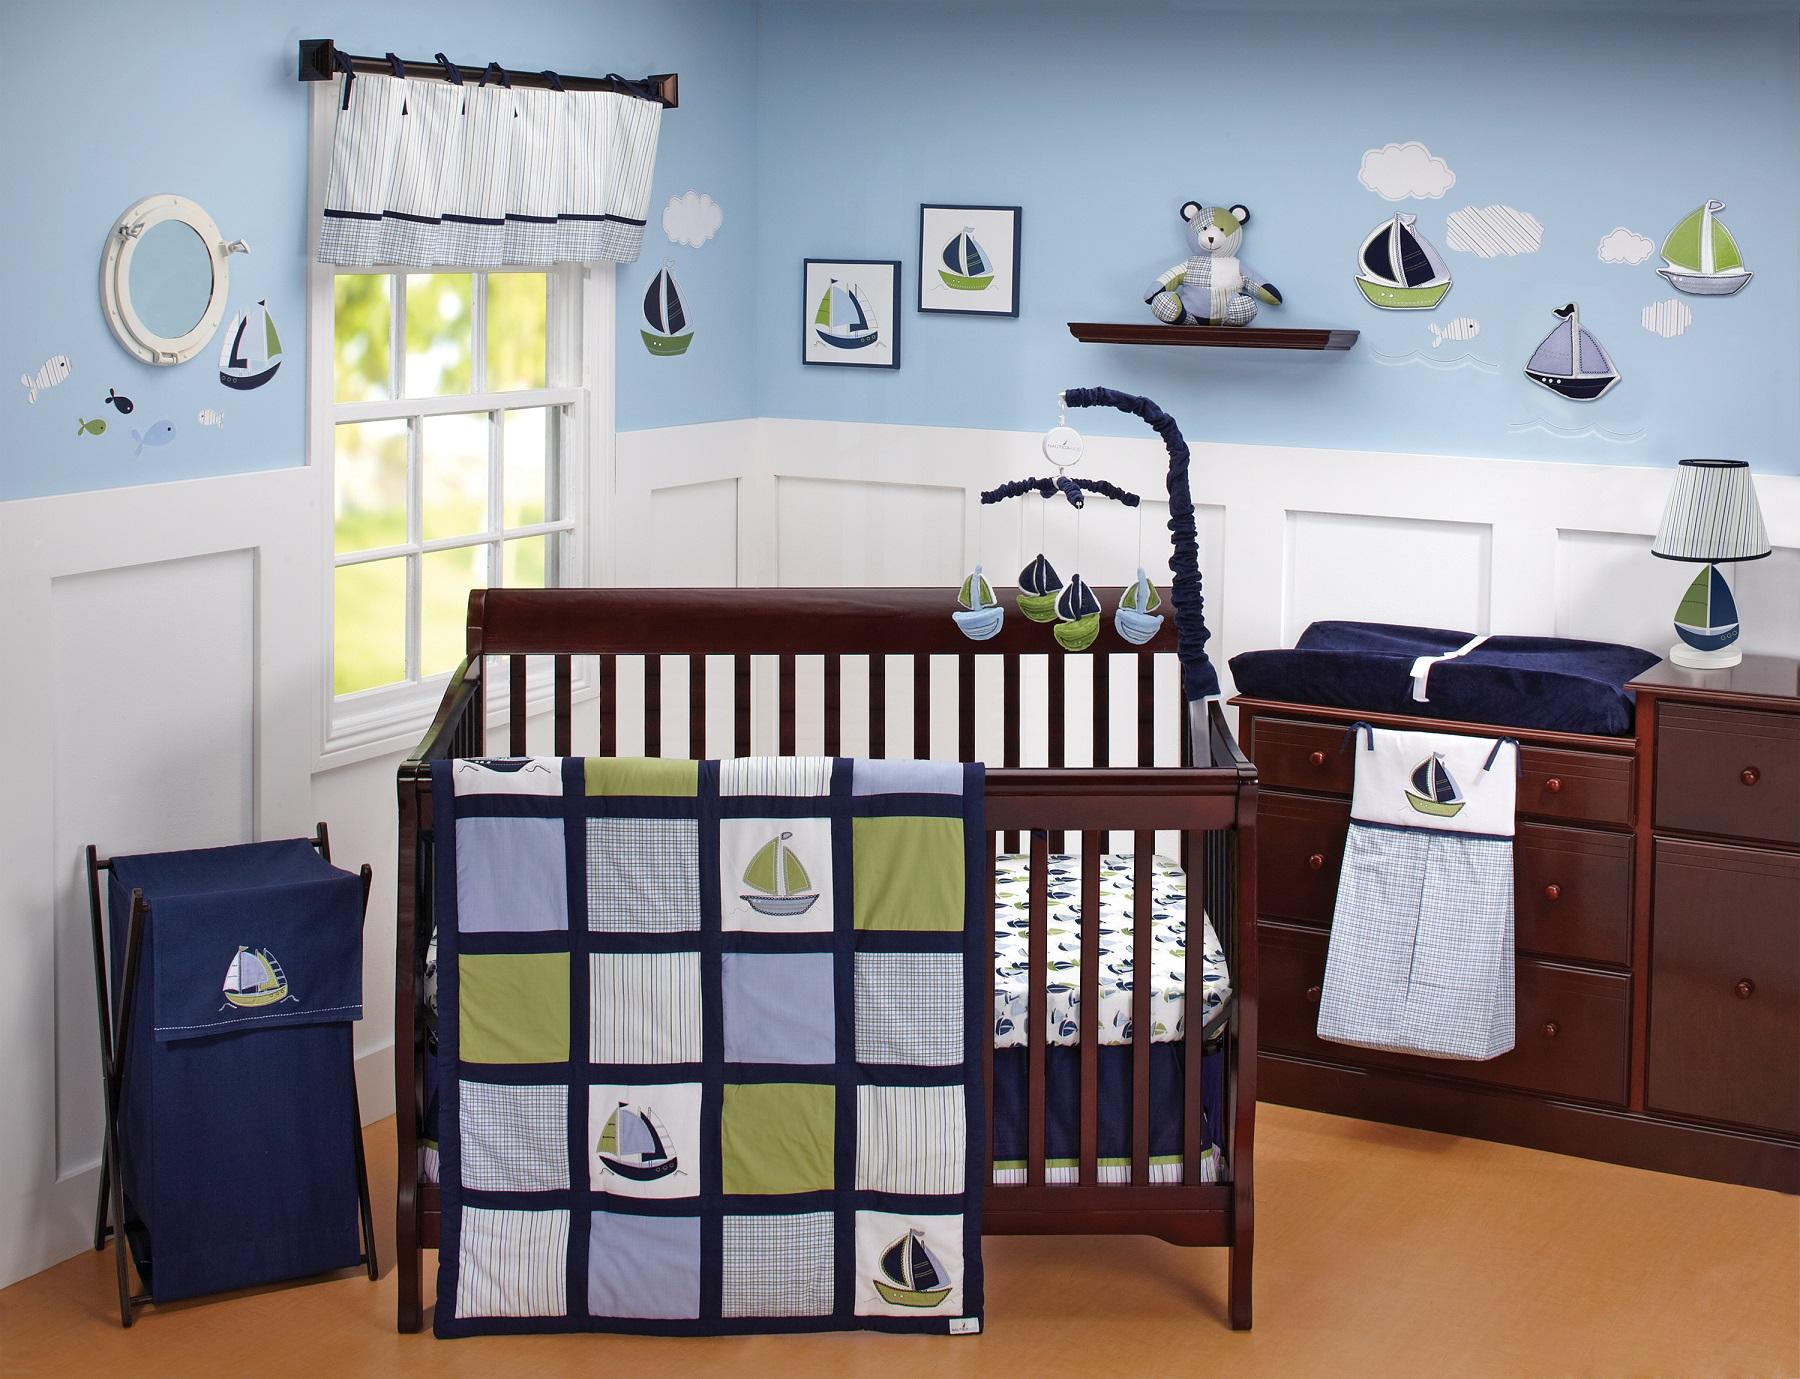 Giveaway Nautica Bedding Set Project Nursery